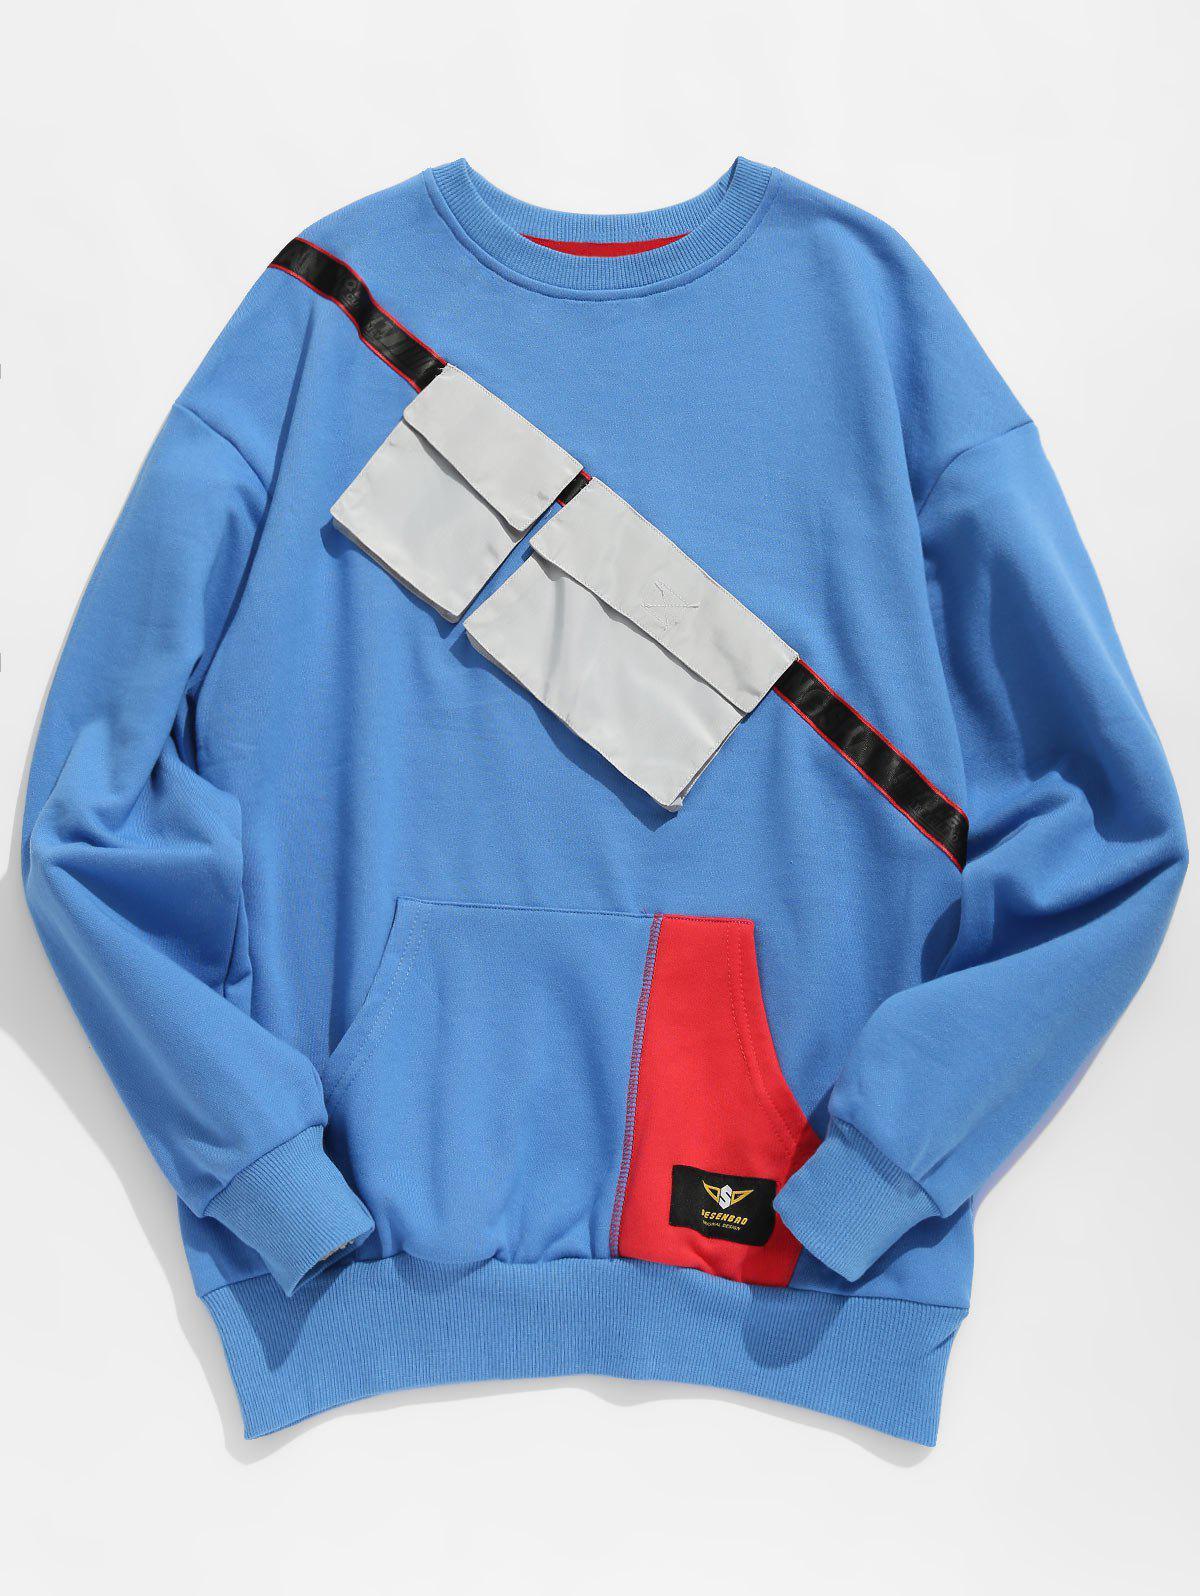 Chest Pockets Embellished Sweatshirt